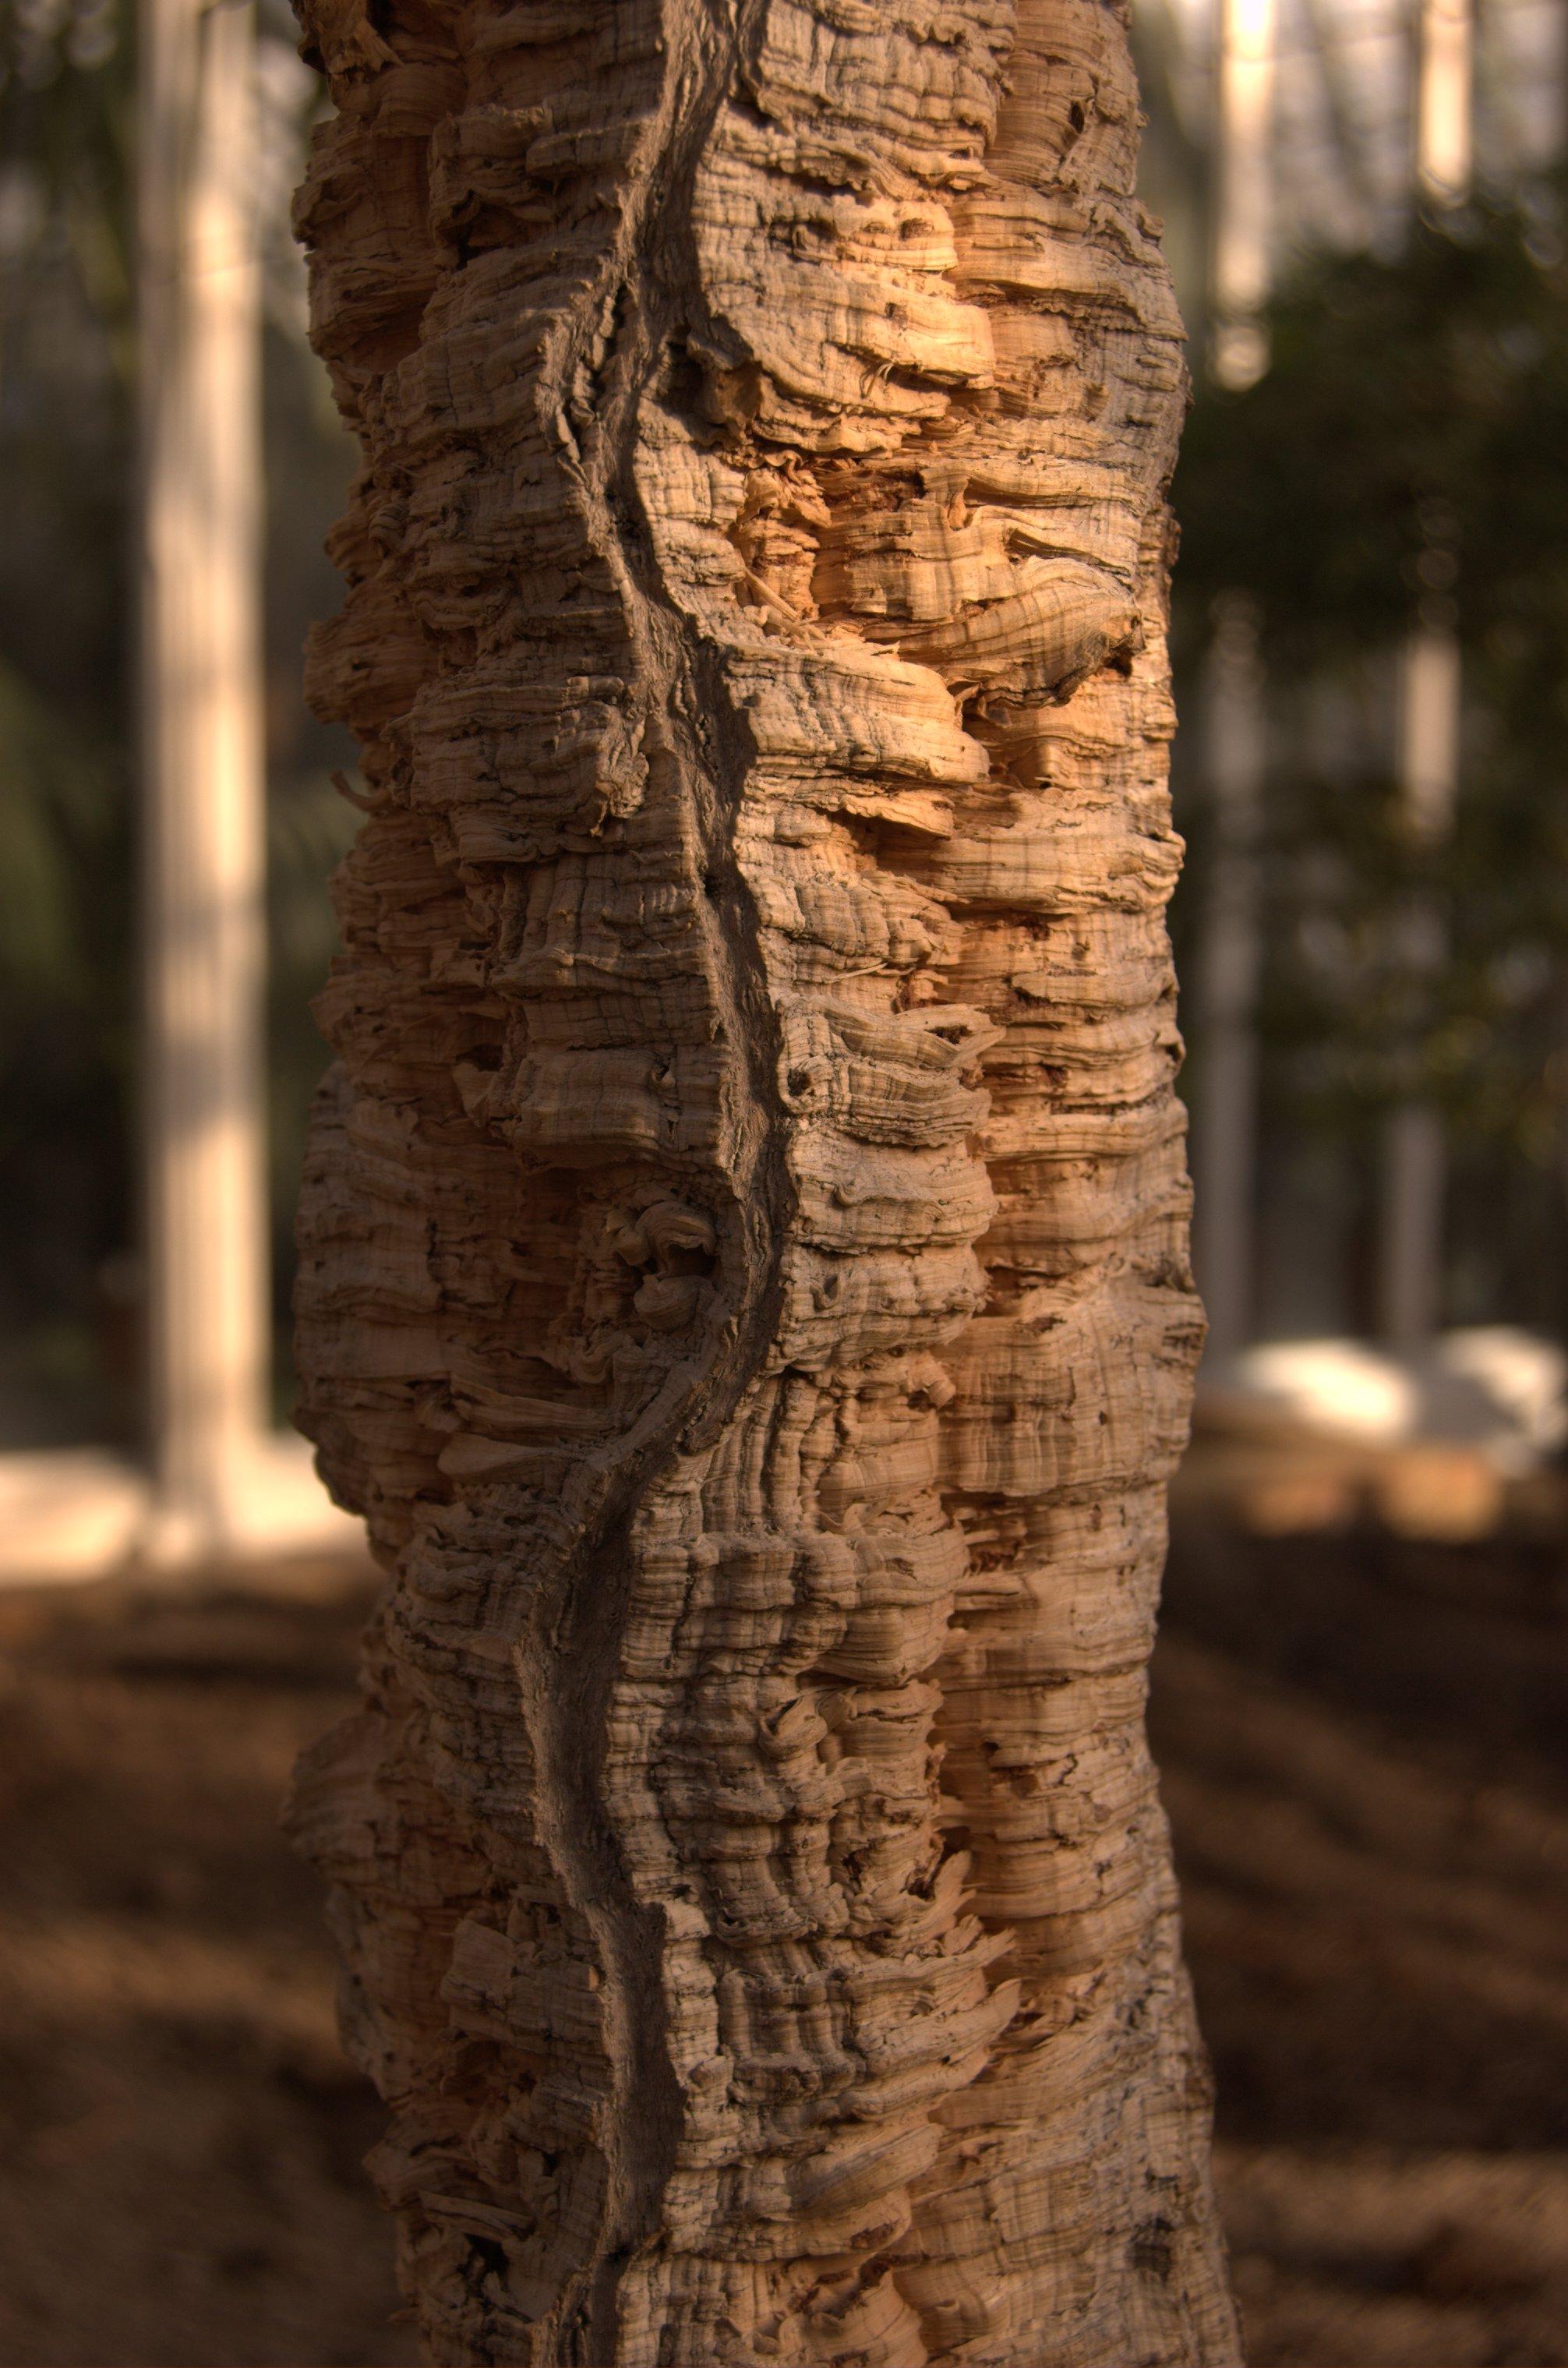 http://upload.wikimedia.org/wikipedia/commons/b/b8/Quercus_suber_aka_cork_oak.jpg